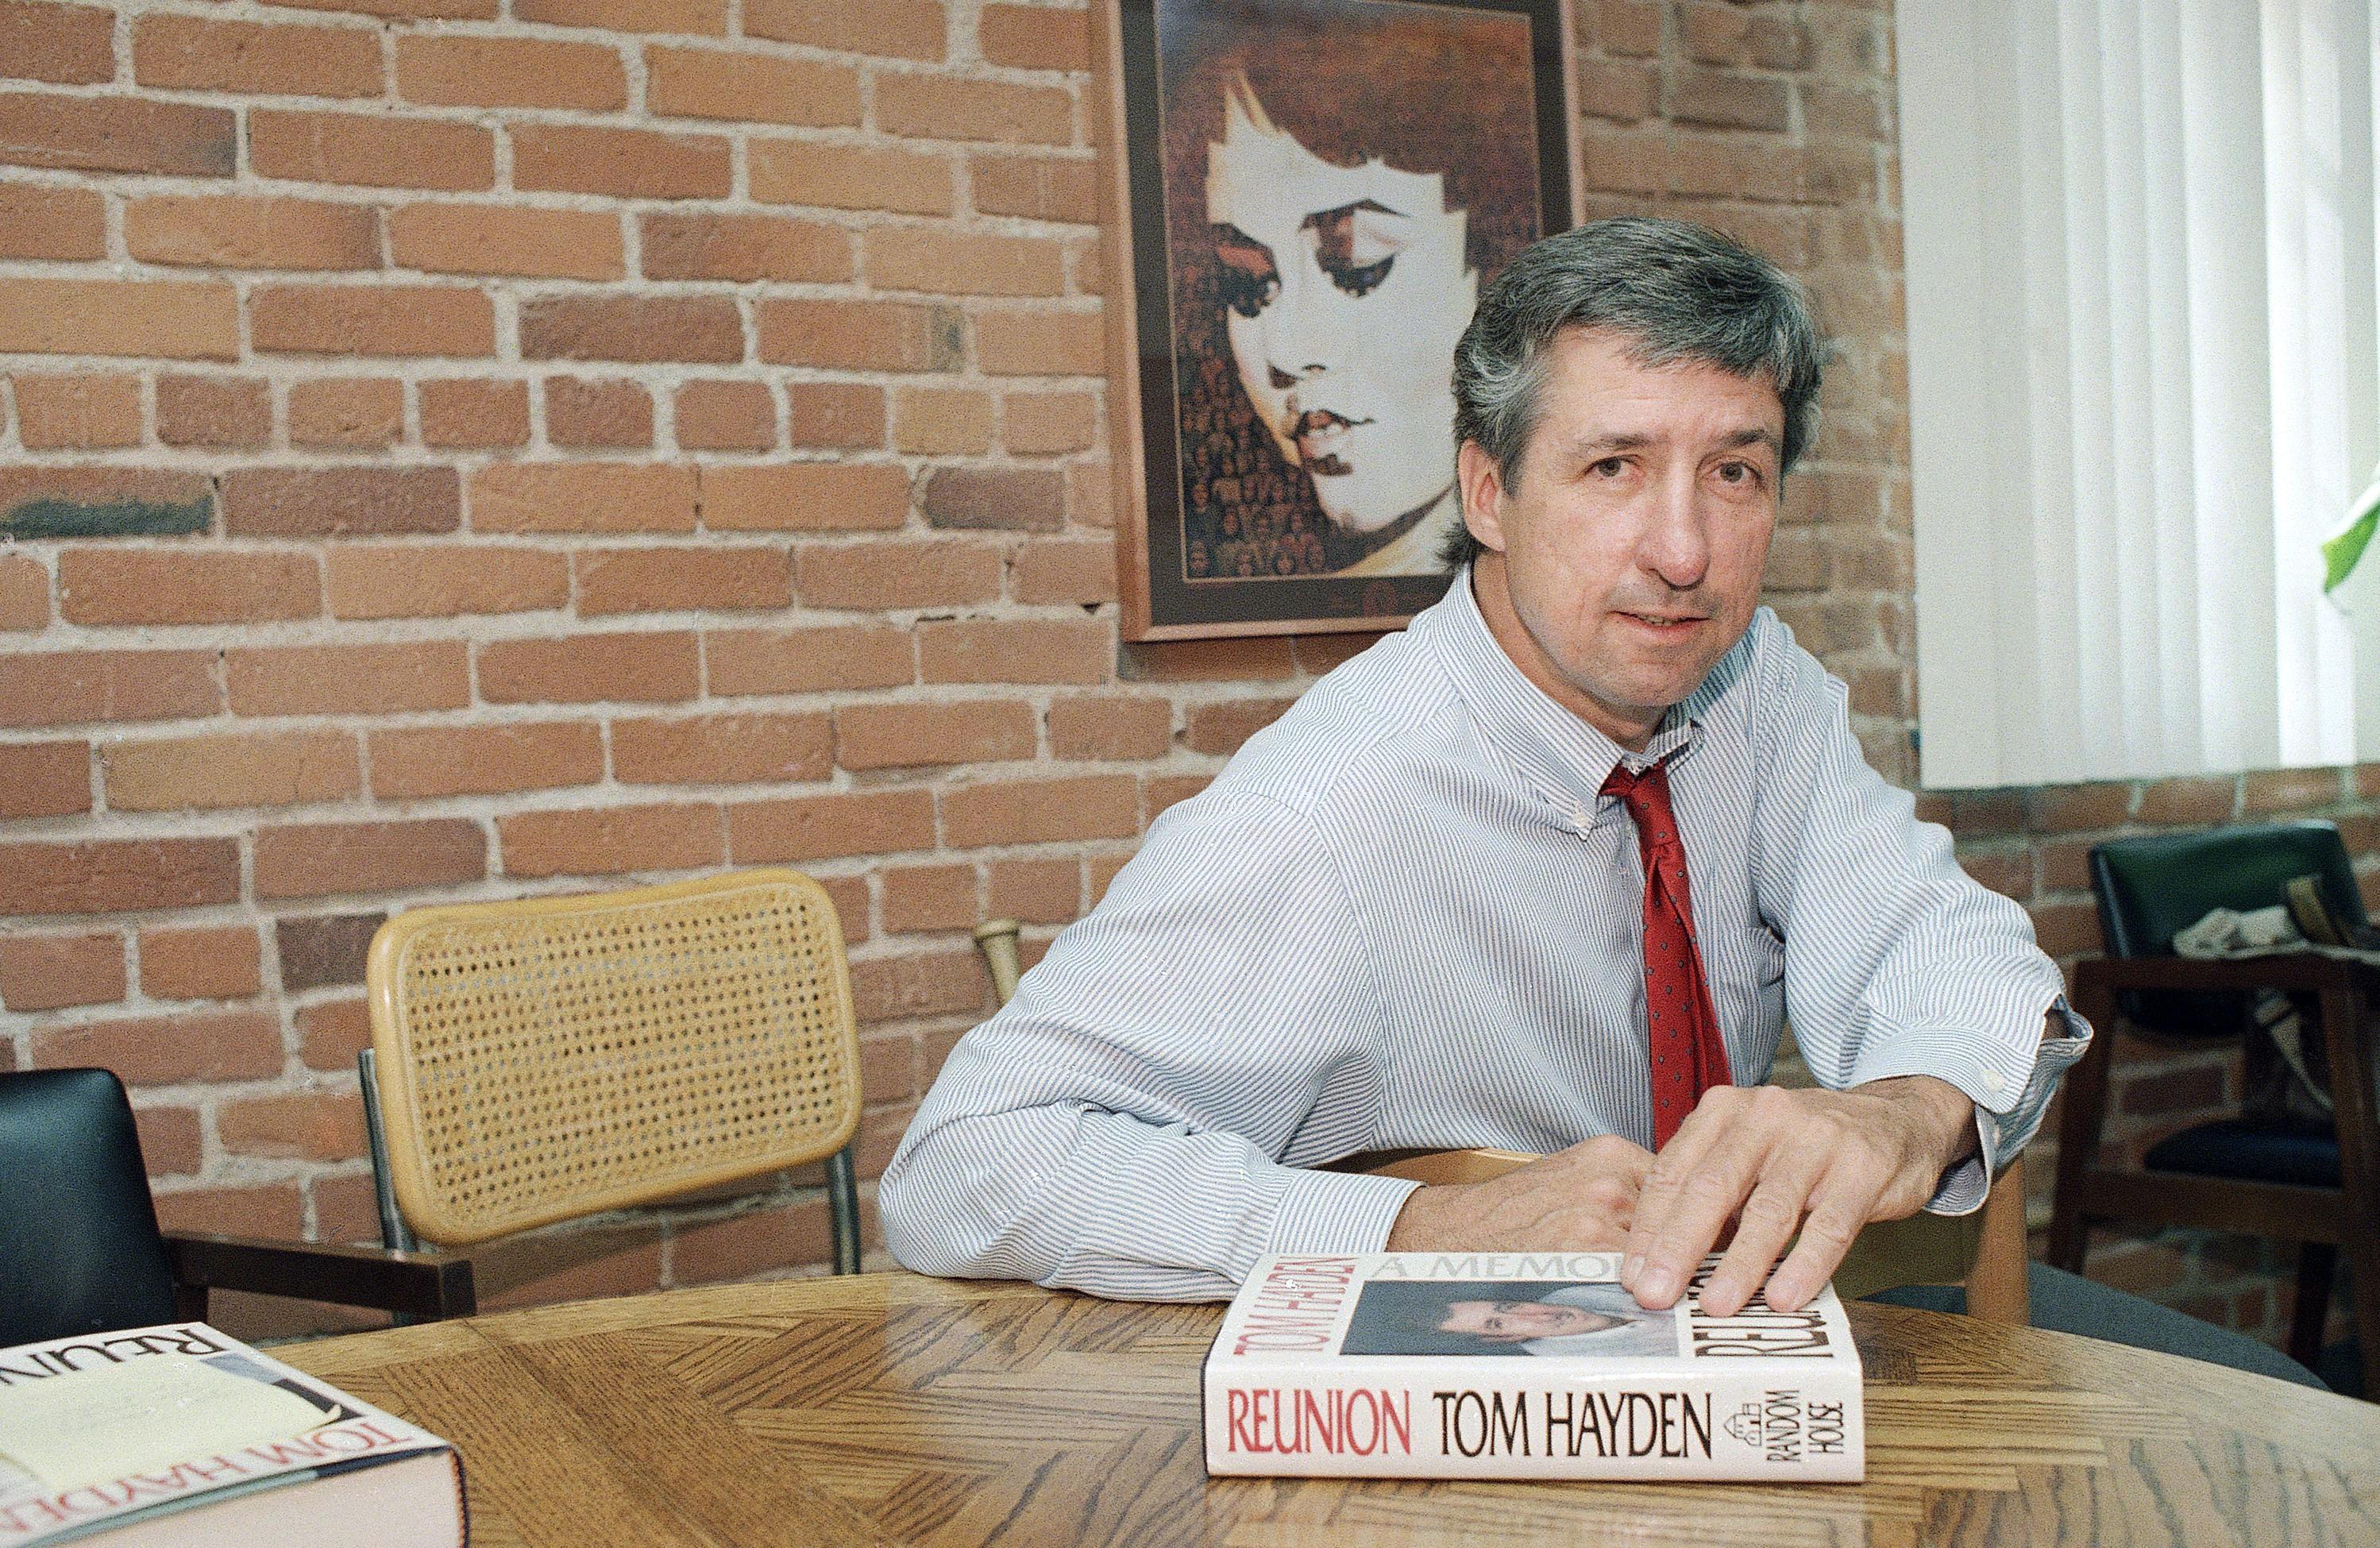 Tom Hayden: Peace activist, lawmaker, teacher, author